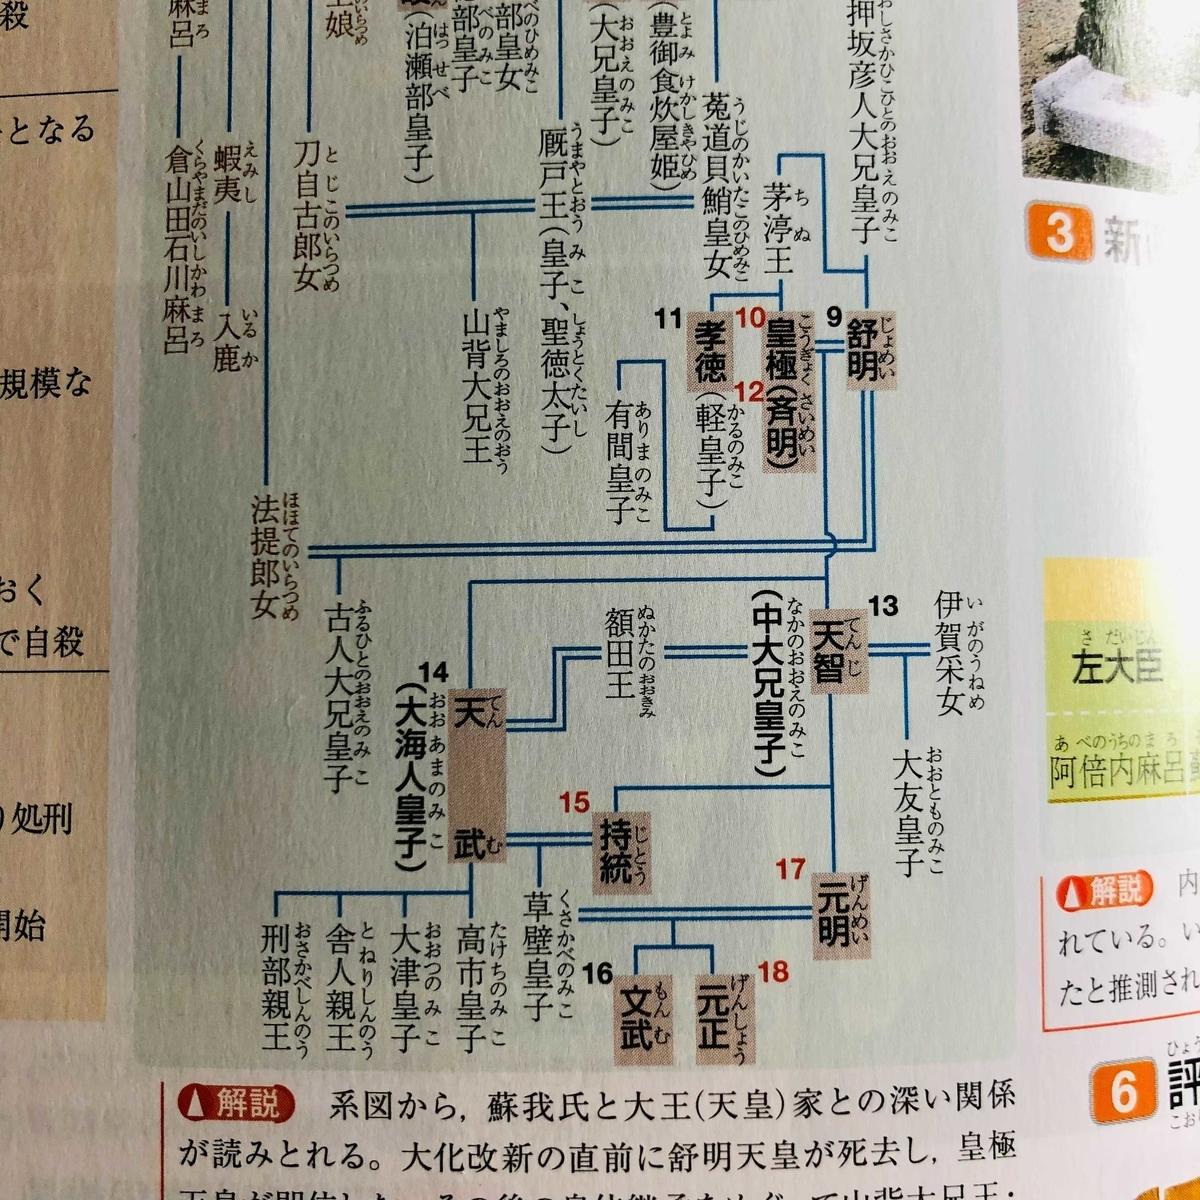 f:id:sakurako-tulipko:20210917094113j:plain